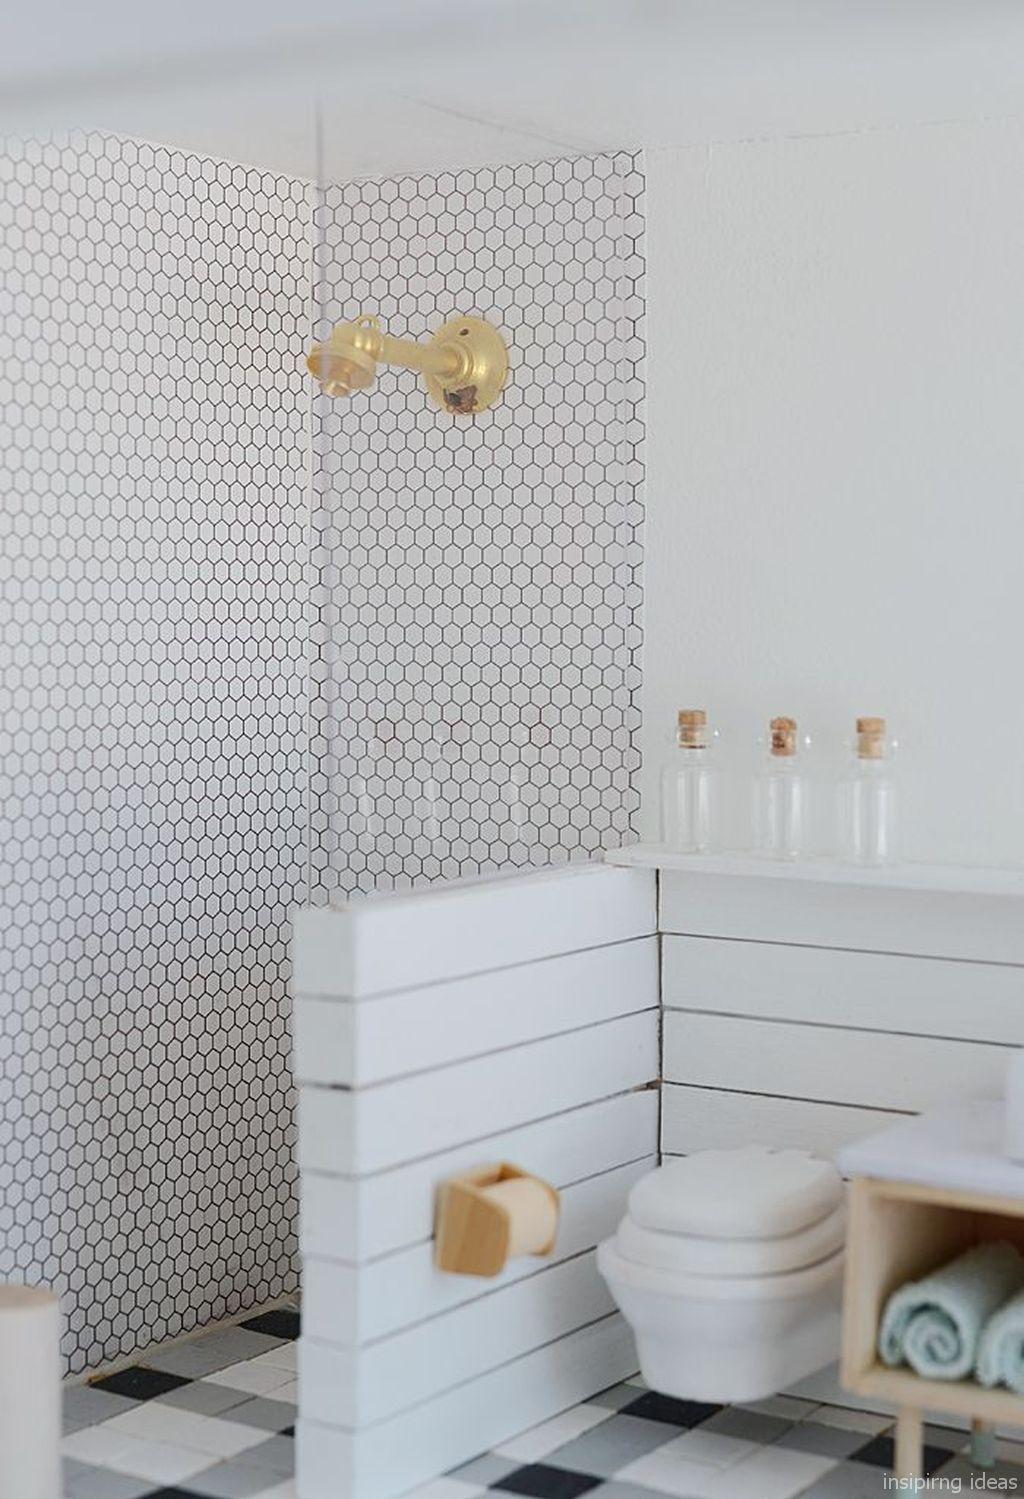 67 Incredible Modern Farmhouse Bathroom Tile Ideas 53 In 2020 Mit Bildern Barbie Haus Mobel Puppenhausmobel Barbie Puppe Haus